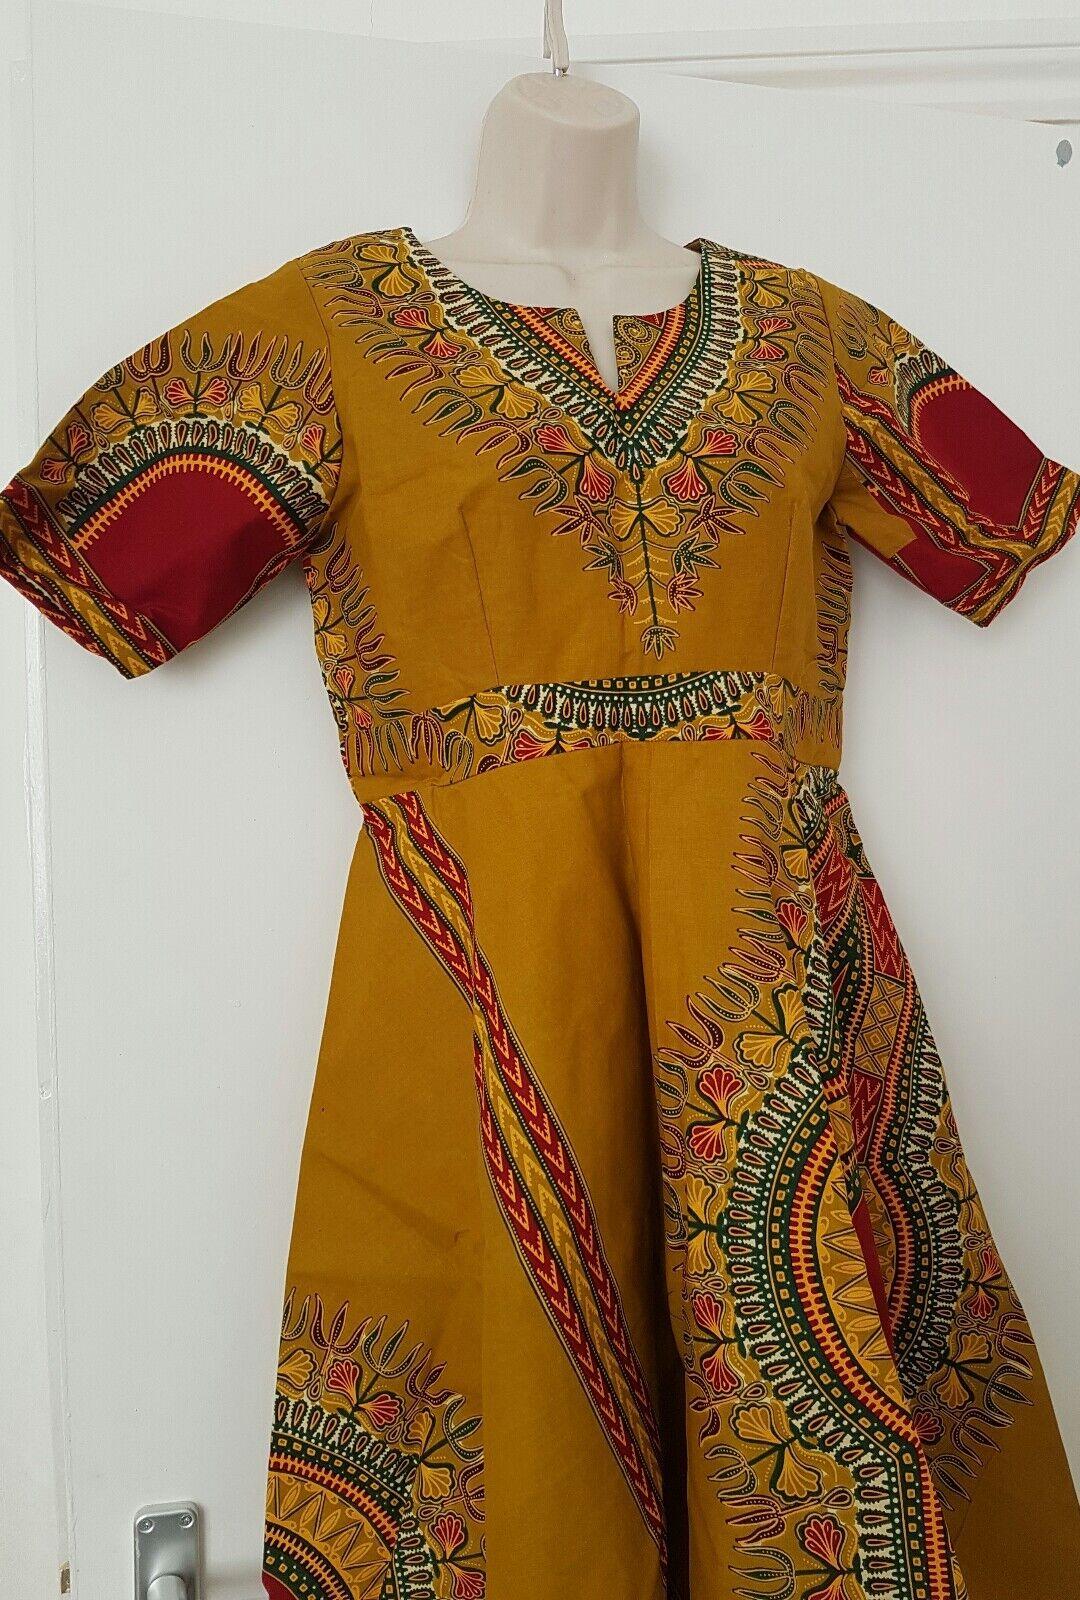 Dashiki Cotone Stampa Tribale Abito Taglia M; GRATIS GRATIS GRATIS UK P & P a20309